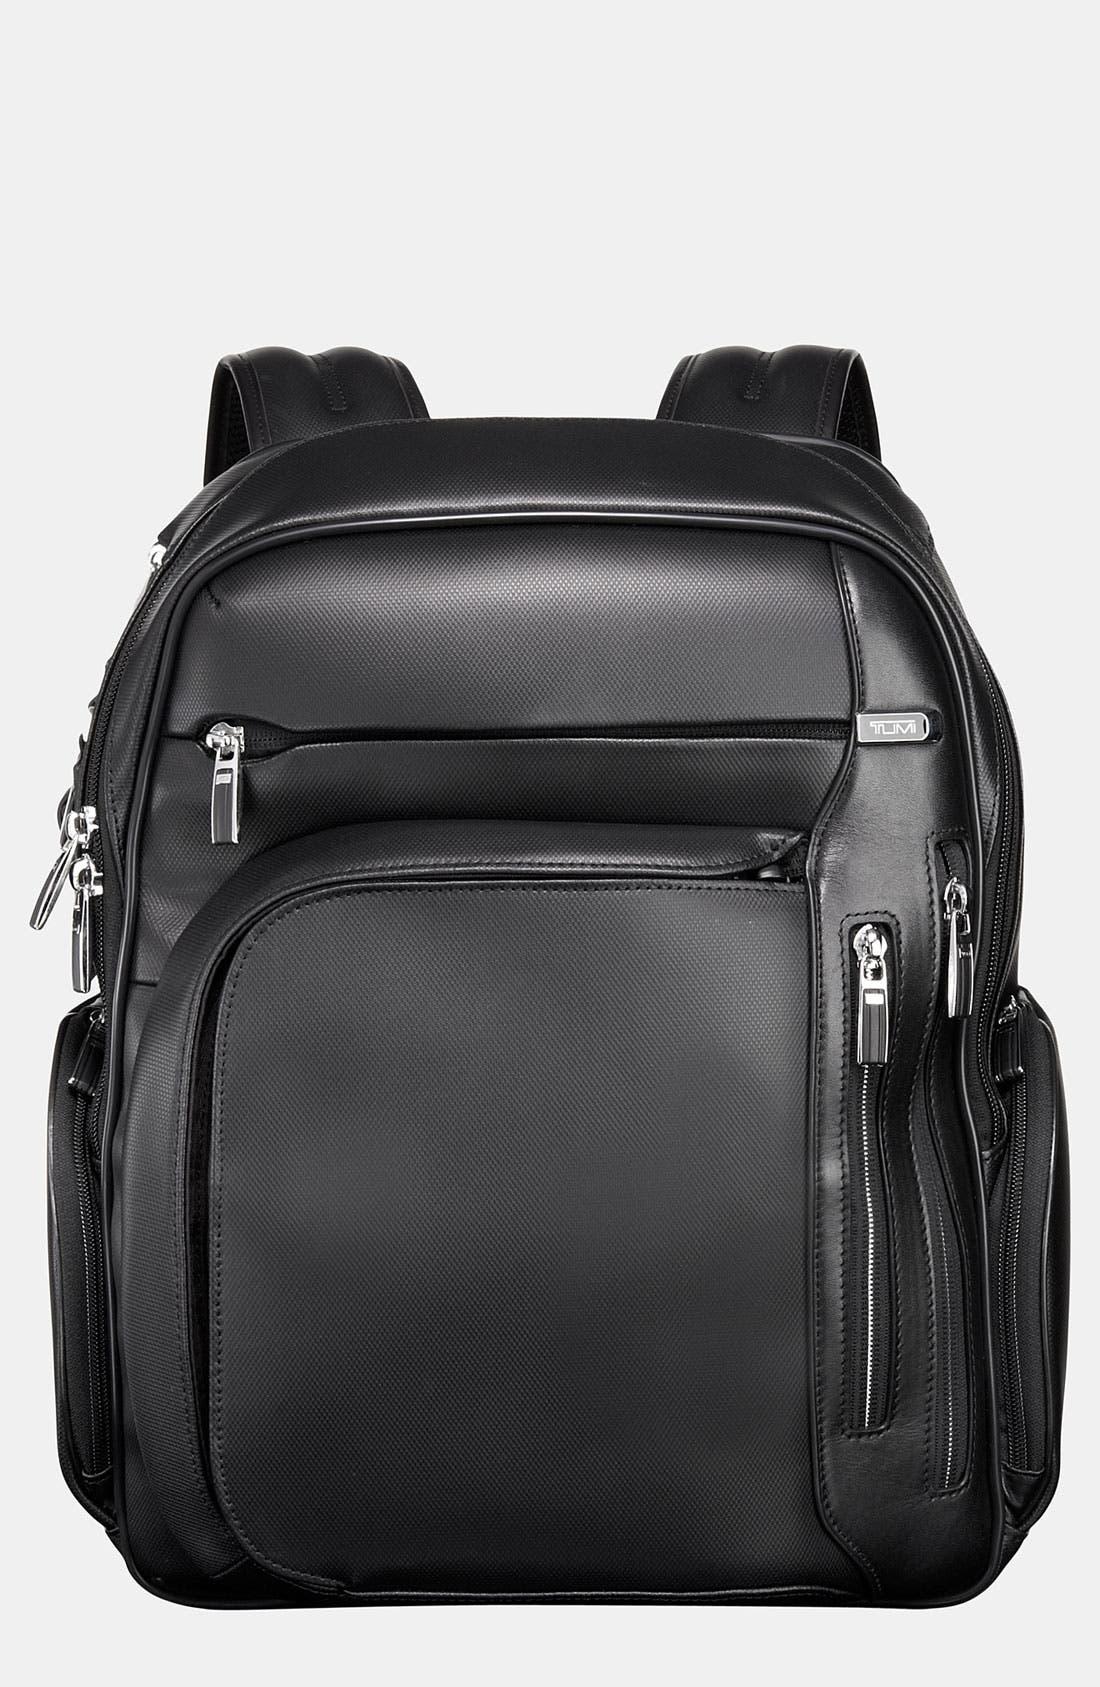 Alternate Image 1 Selected - Tumi 'Arrive - Kingsford' Leather Backpack